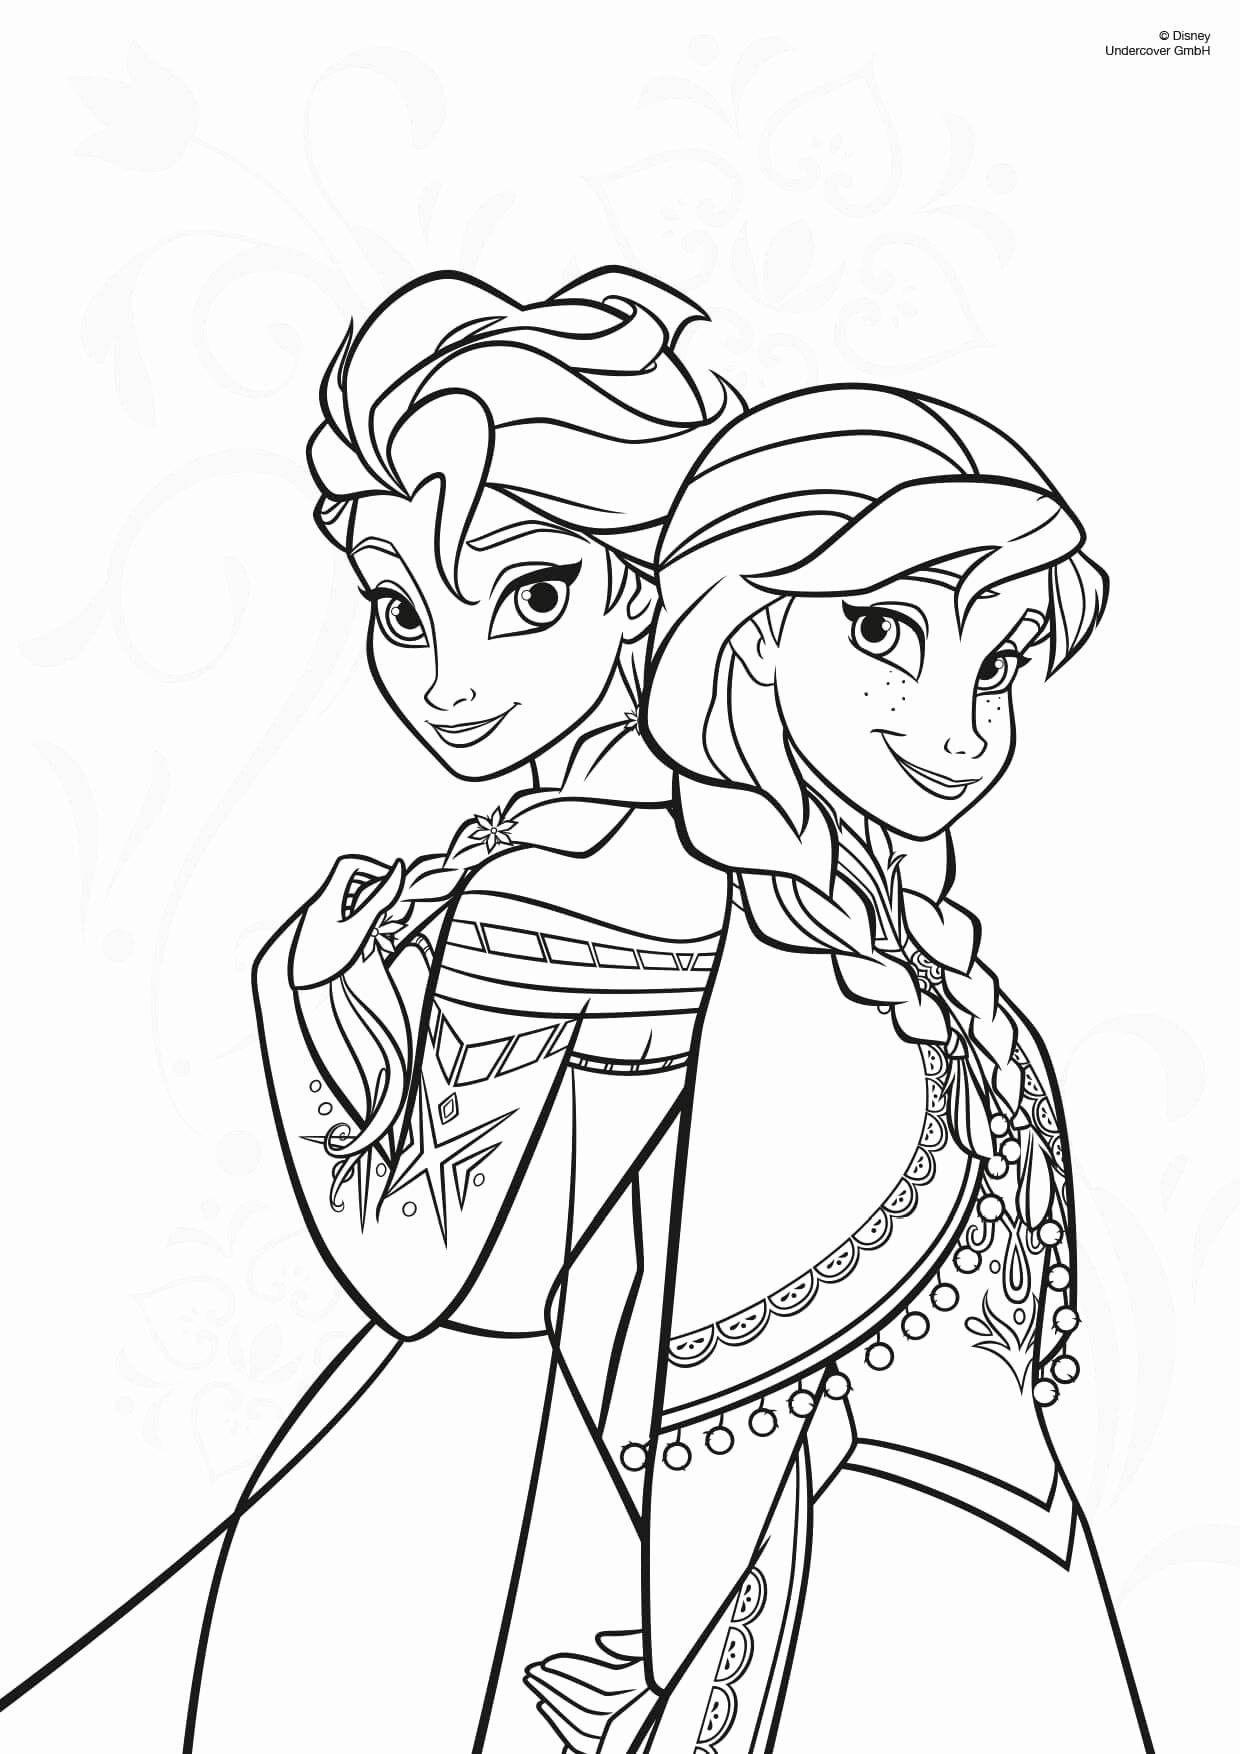 Neu Malvorlagen Anna Und Elsa Kostenlos Rapunzel Coloring Pages Disney Rapunzel Baby Coloring Pages